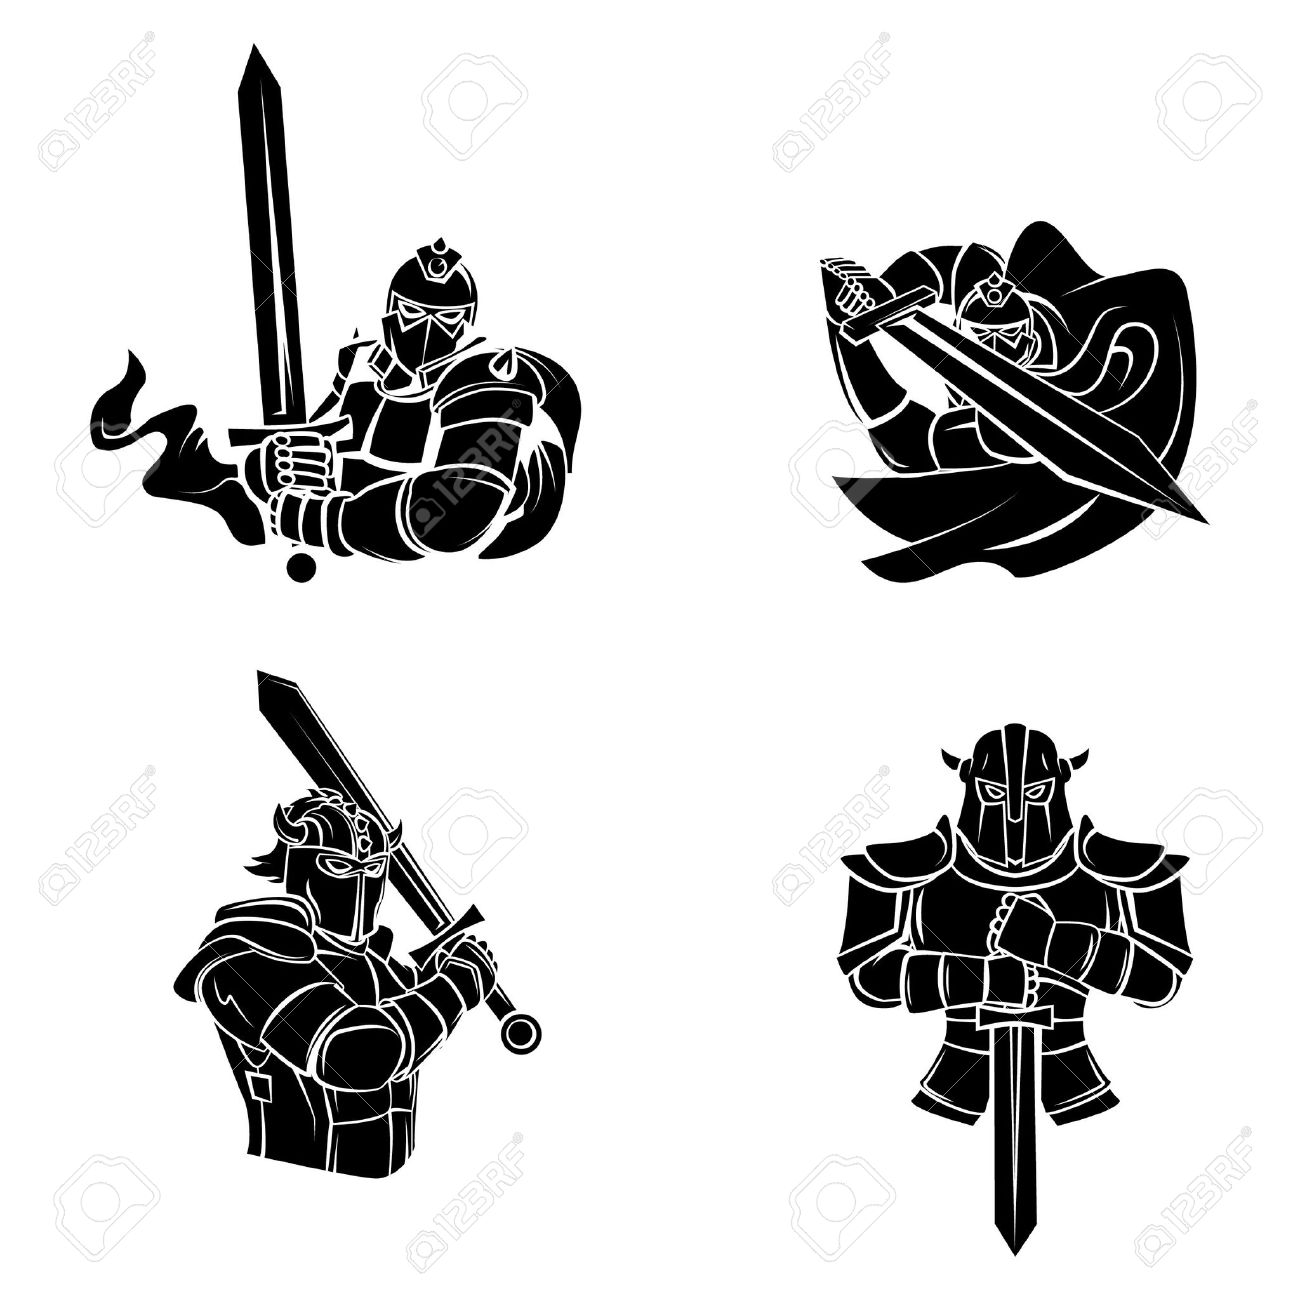 Warrior symbol tattoos gallery symbol and sign ideas tattoo symbol of knight warrior royalty free cliparts vectors tattoo symbol of knight warrior buycottarizona gallery biocorpaavc Images